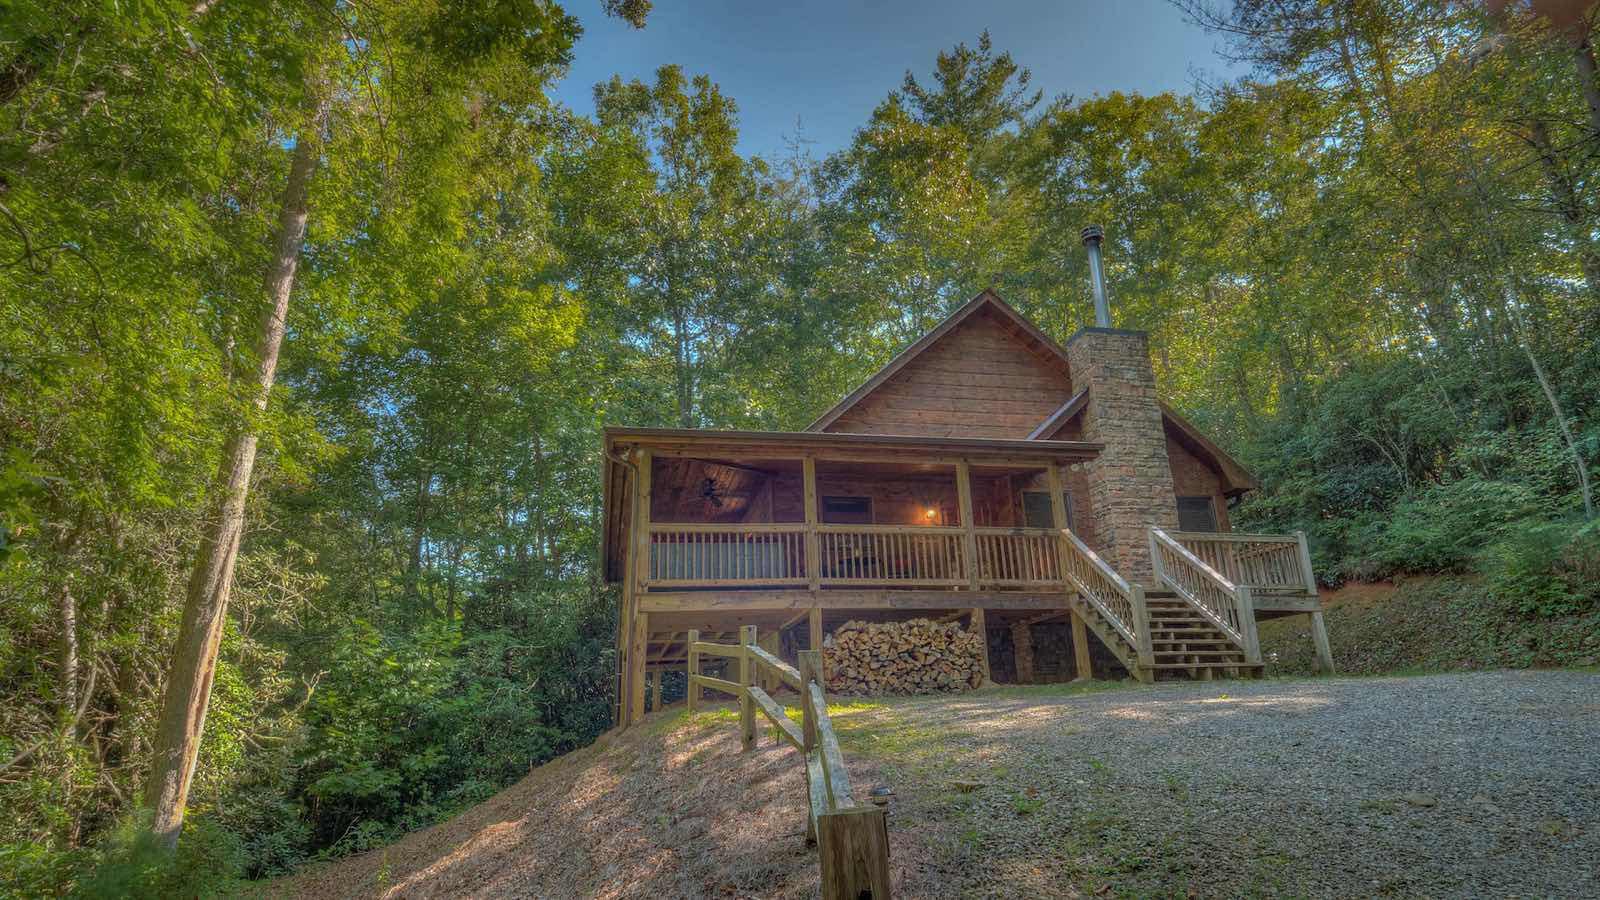 100 vacation cabin rentals near atlanta ga for Rental cabins in ga